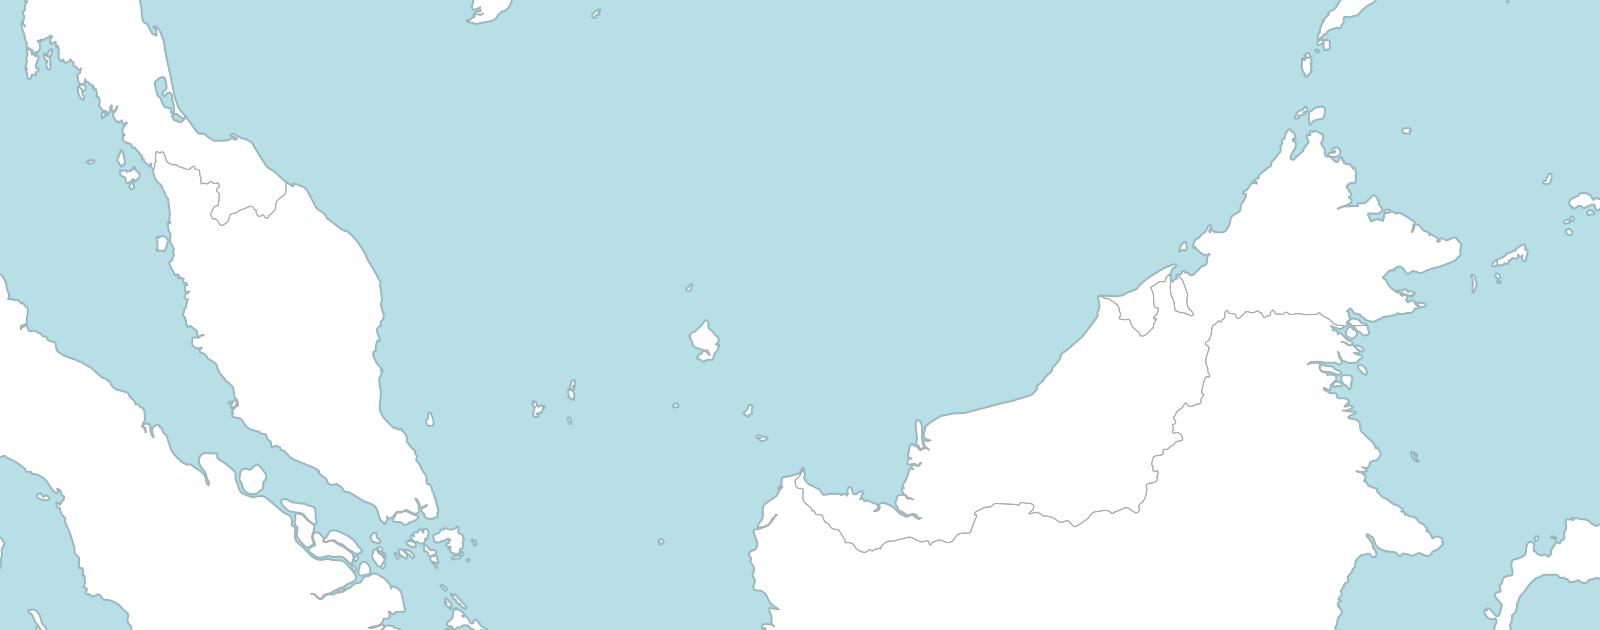 6 free maps of Malaysia - ASEAN UP Malaysia Map Image on sarawak map, iran map, pacific islands map, china map, cyprus map, europe map, phillipines map, armenia map, yemen map, kota kinabalu map, world map, australia map, singapore on map, thailand map, united kingdom map, french polynesia map, holland map, japan map, chile map, selangor map, ireland map, georgia map, ukraine map,